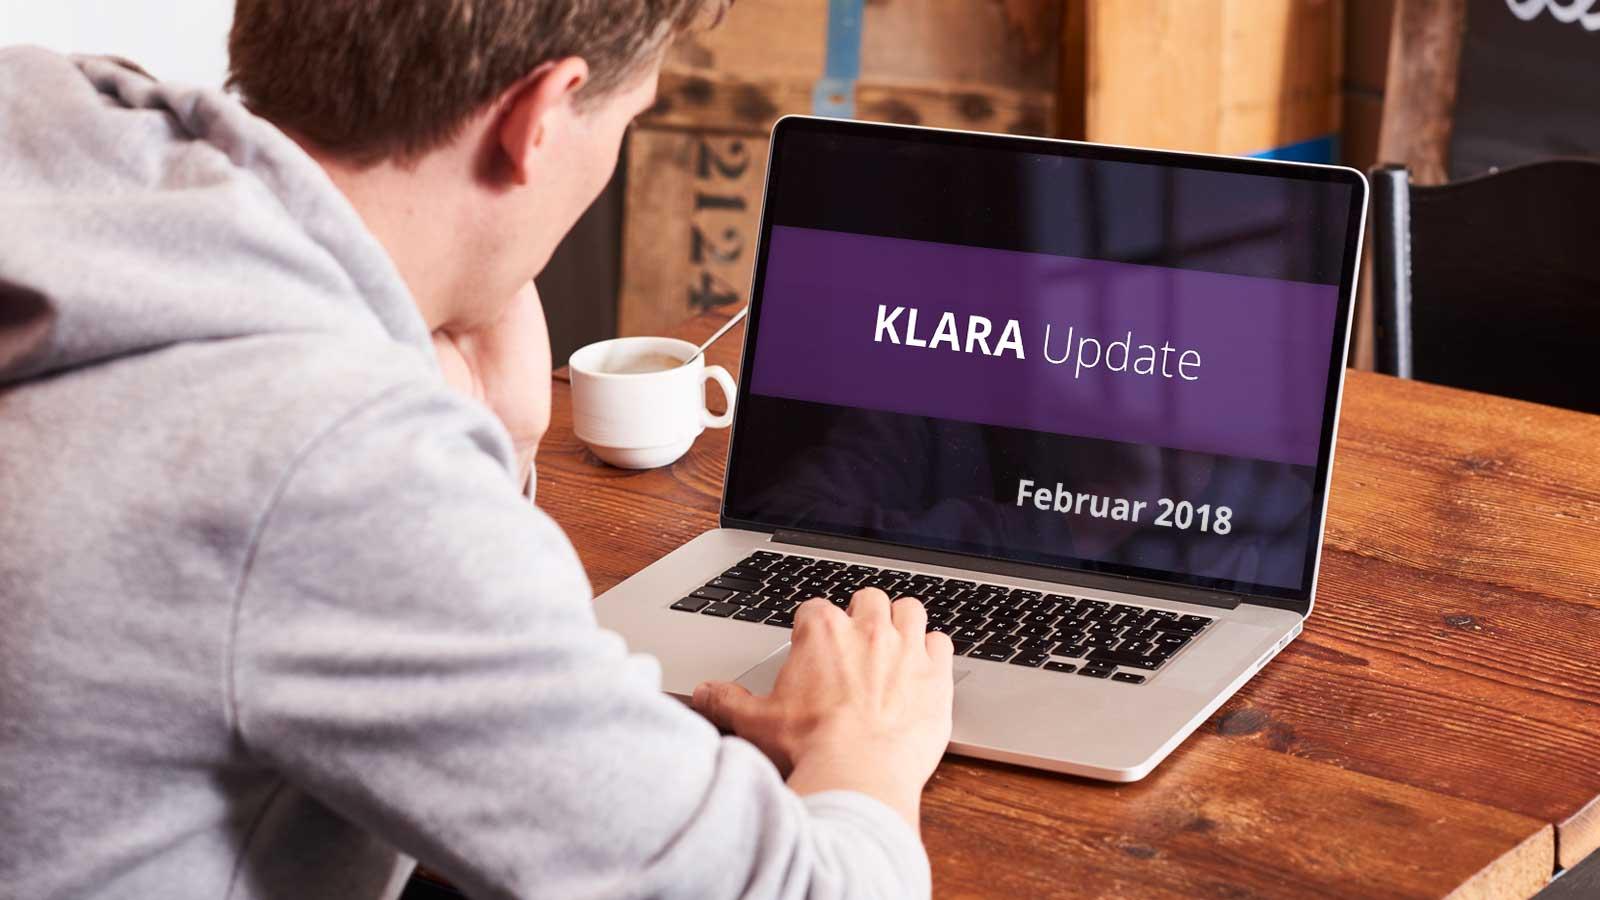 klara_update_feb18